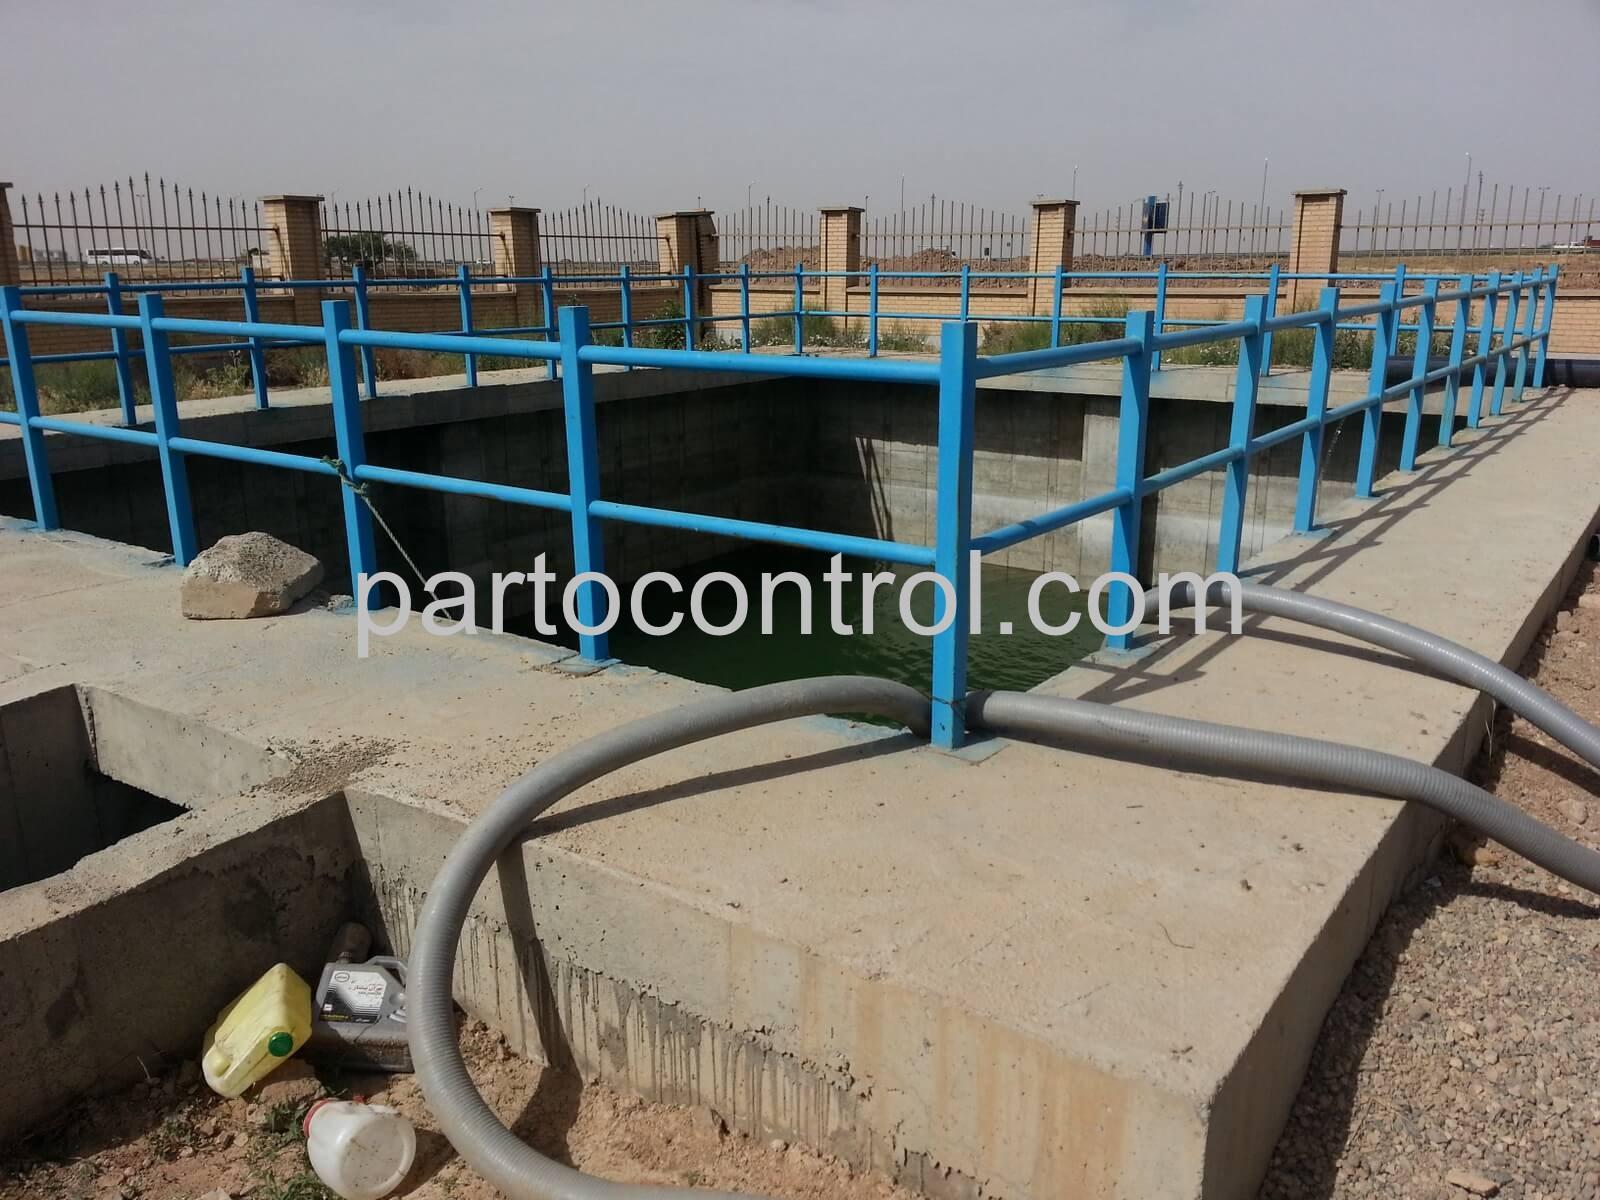 Concrete tanks in Caspian Townمخازن بتنی شهرک کاسپین 1 - پروژه مخازن بتنی